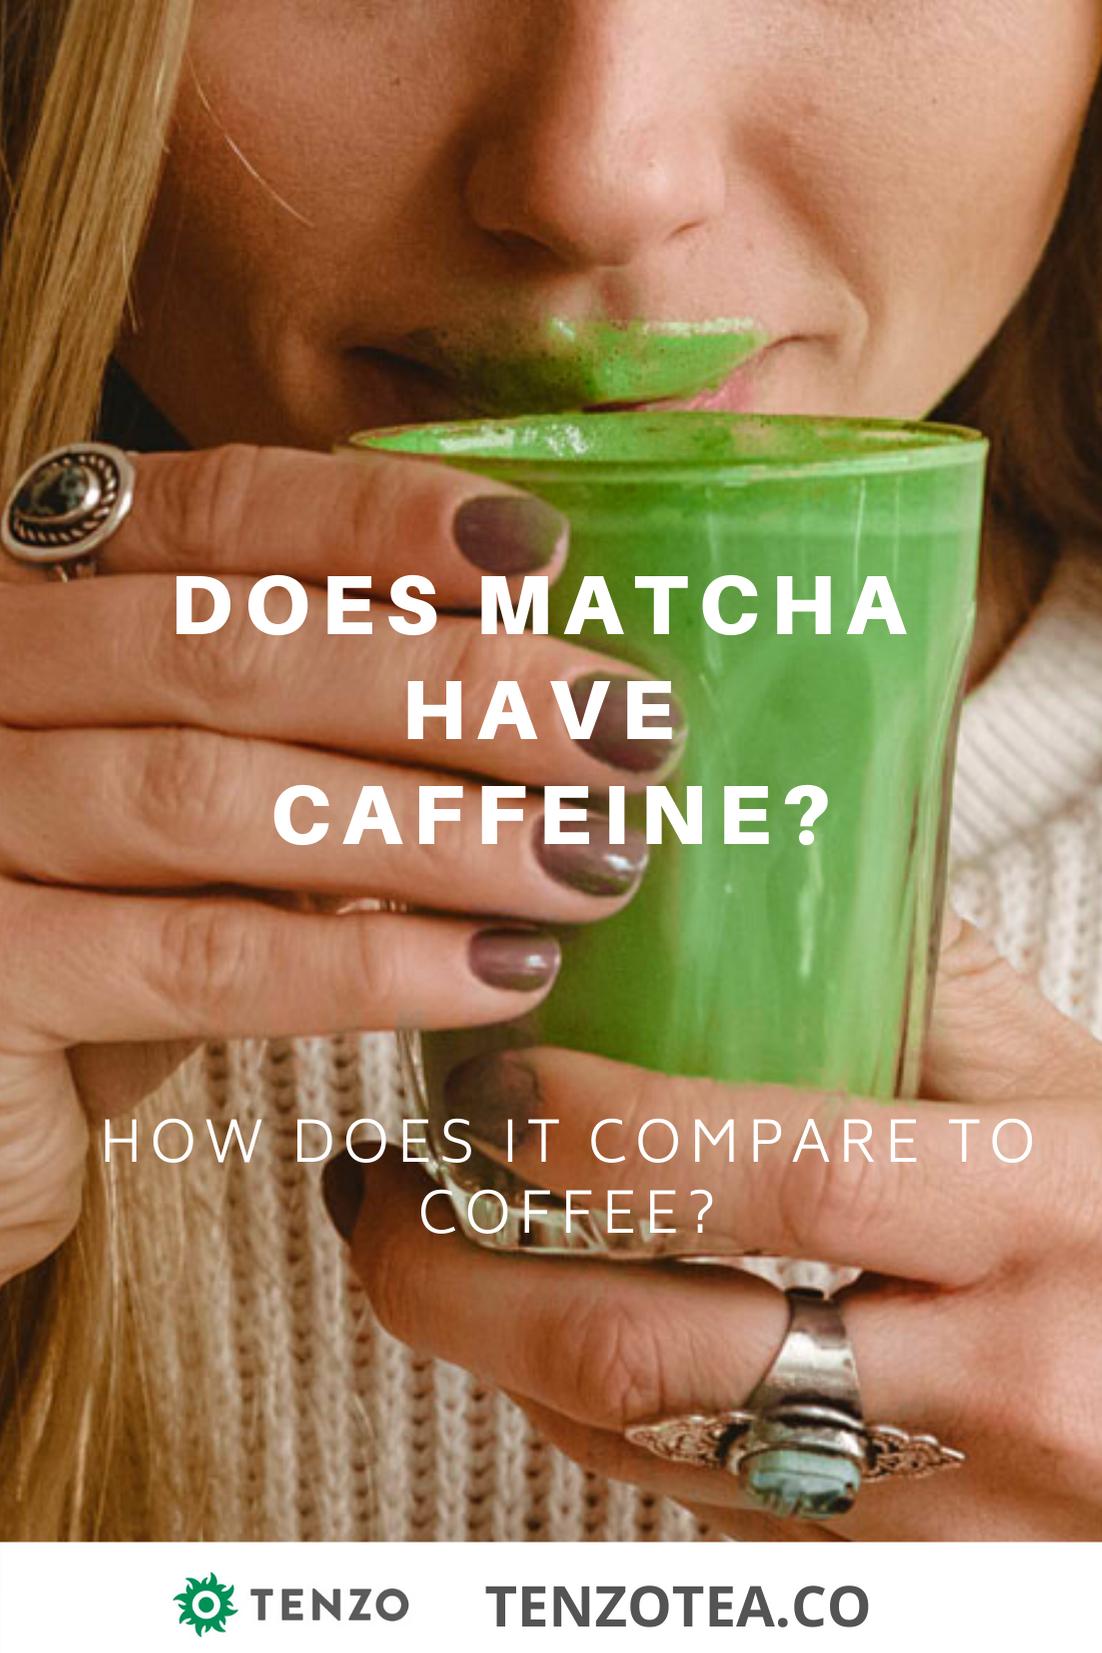 Matcha Caffeine in 2020 Matcha, Matcha green tea powder